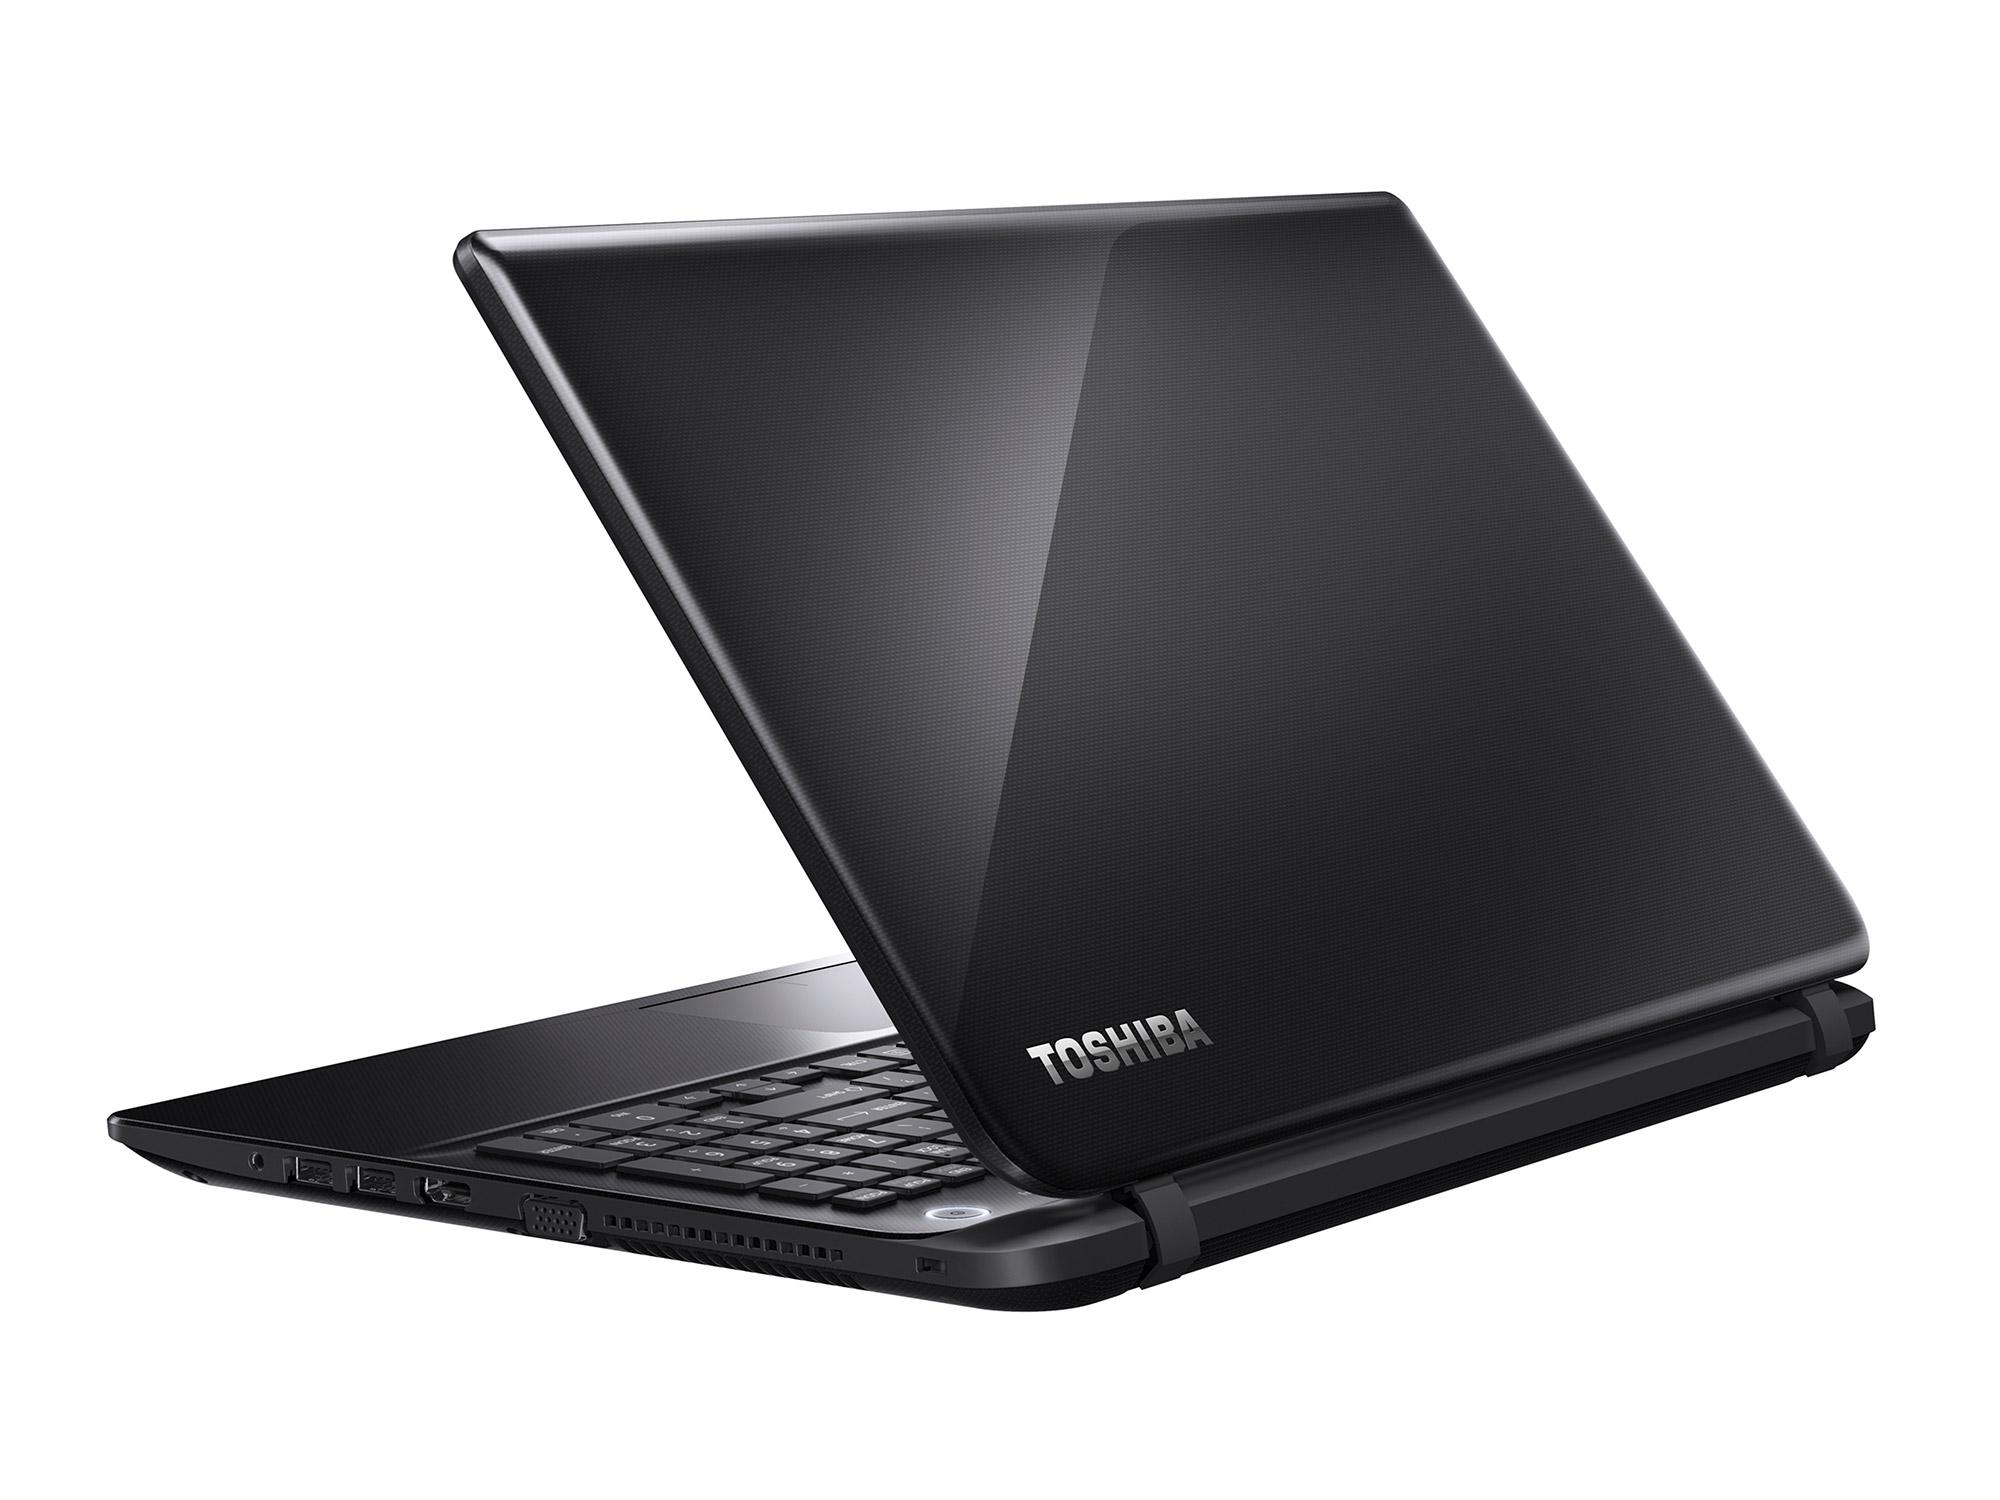 112357ec5c23 Toshiba laptop, Toshiba notebook, Toshiba Satellite L750